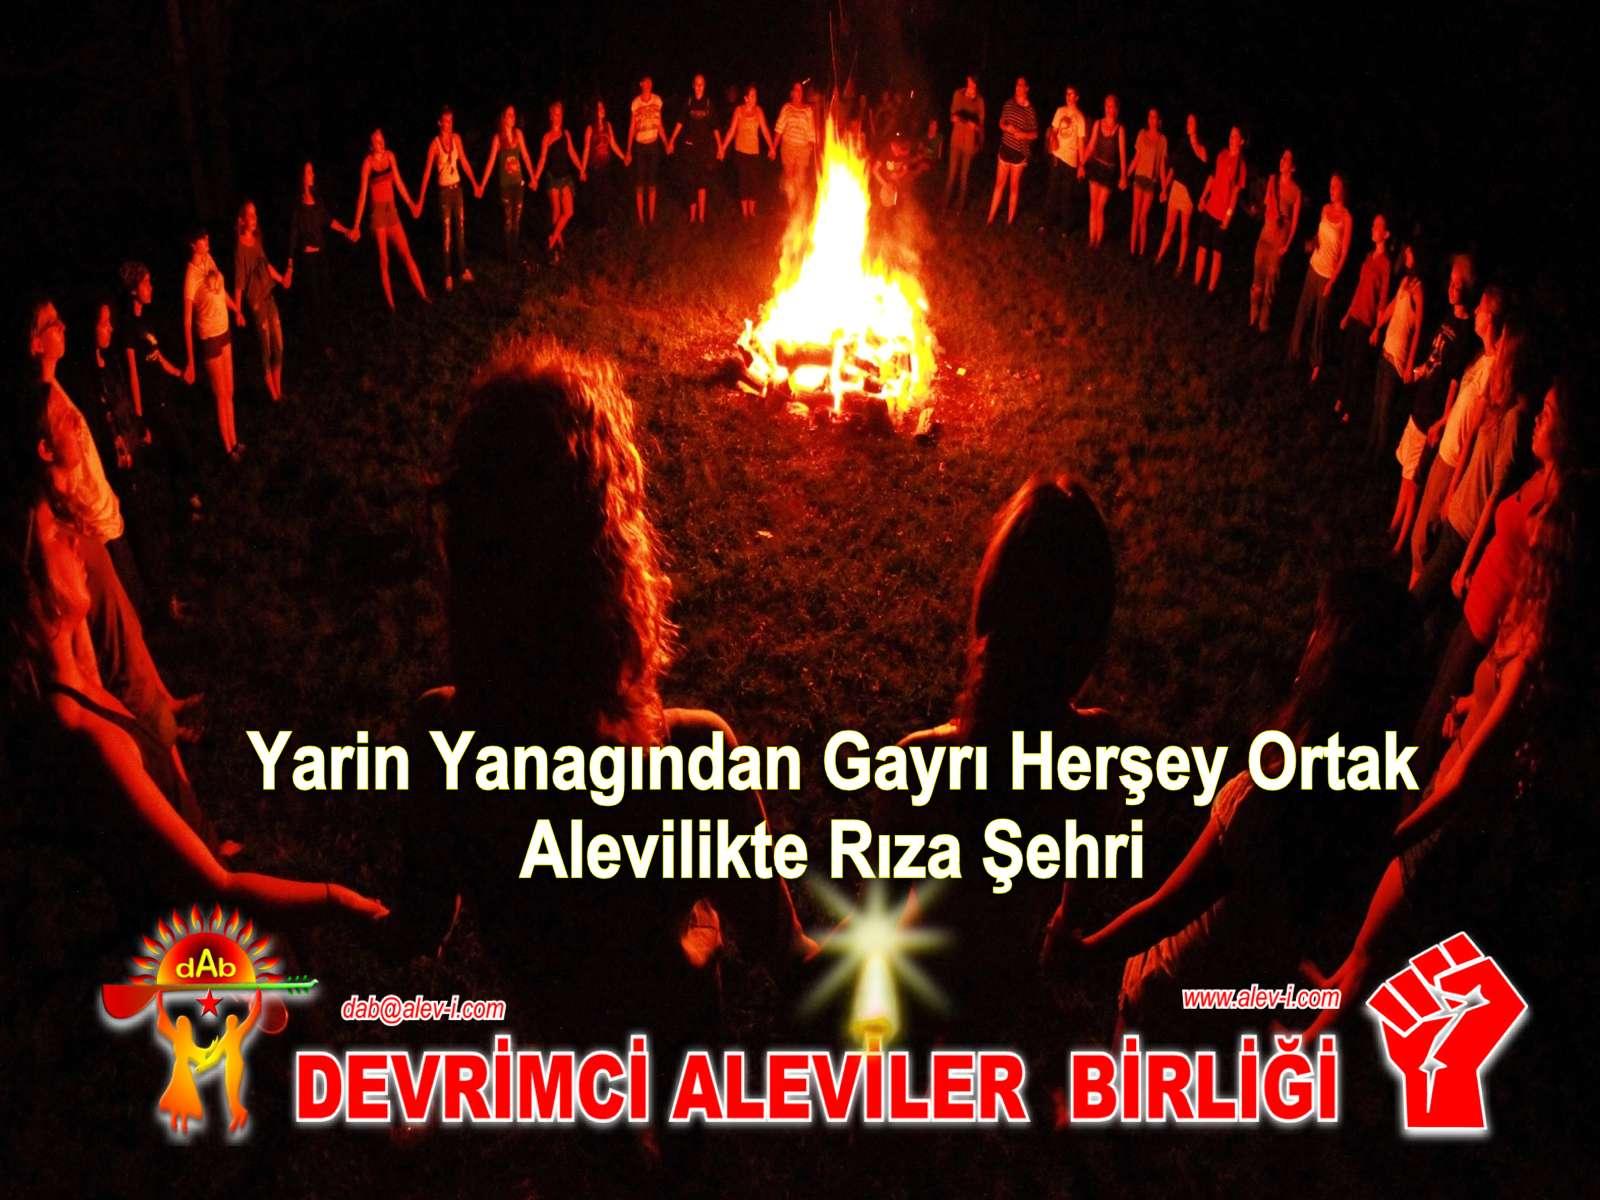 Devrimci Aleviler Birliği DAB Alevi Kızılbaş Bektaşi pir sultan cem hz Ali 12 imam semah Feramuz Şah Acar riza sehri1